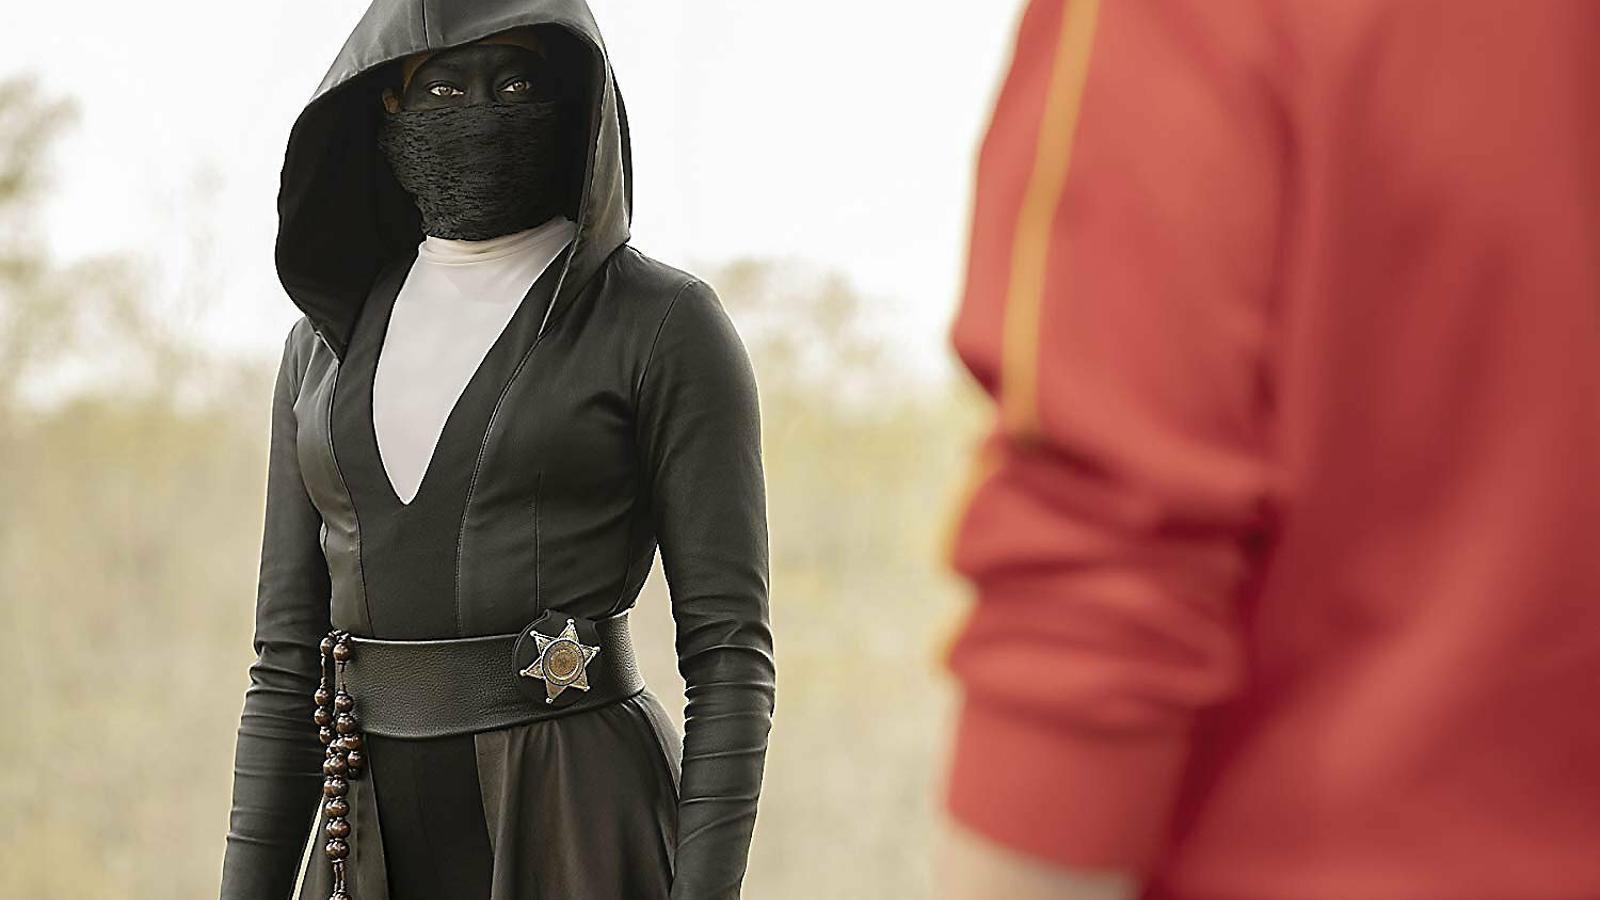 Els Watchmen de la HBO lluiten contra el racisme